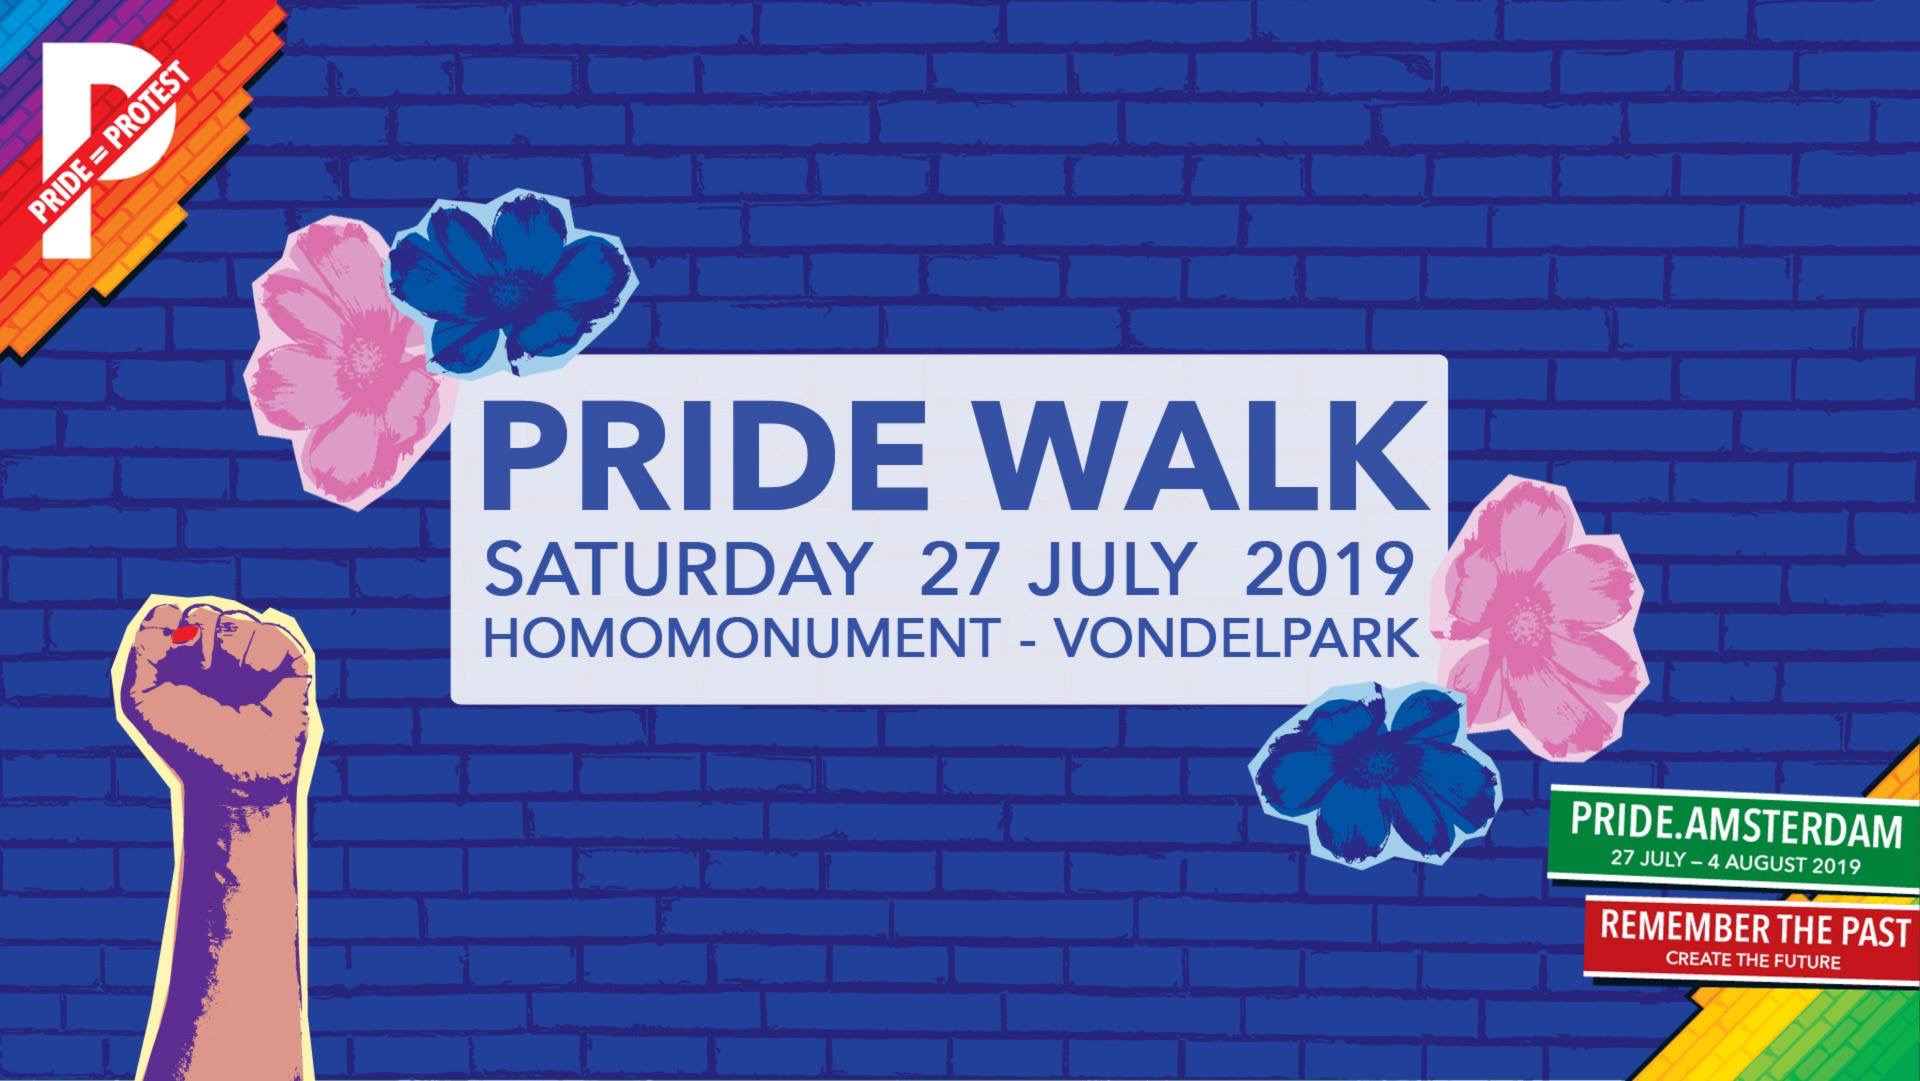 Pride Walk Amsterdam 2019